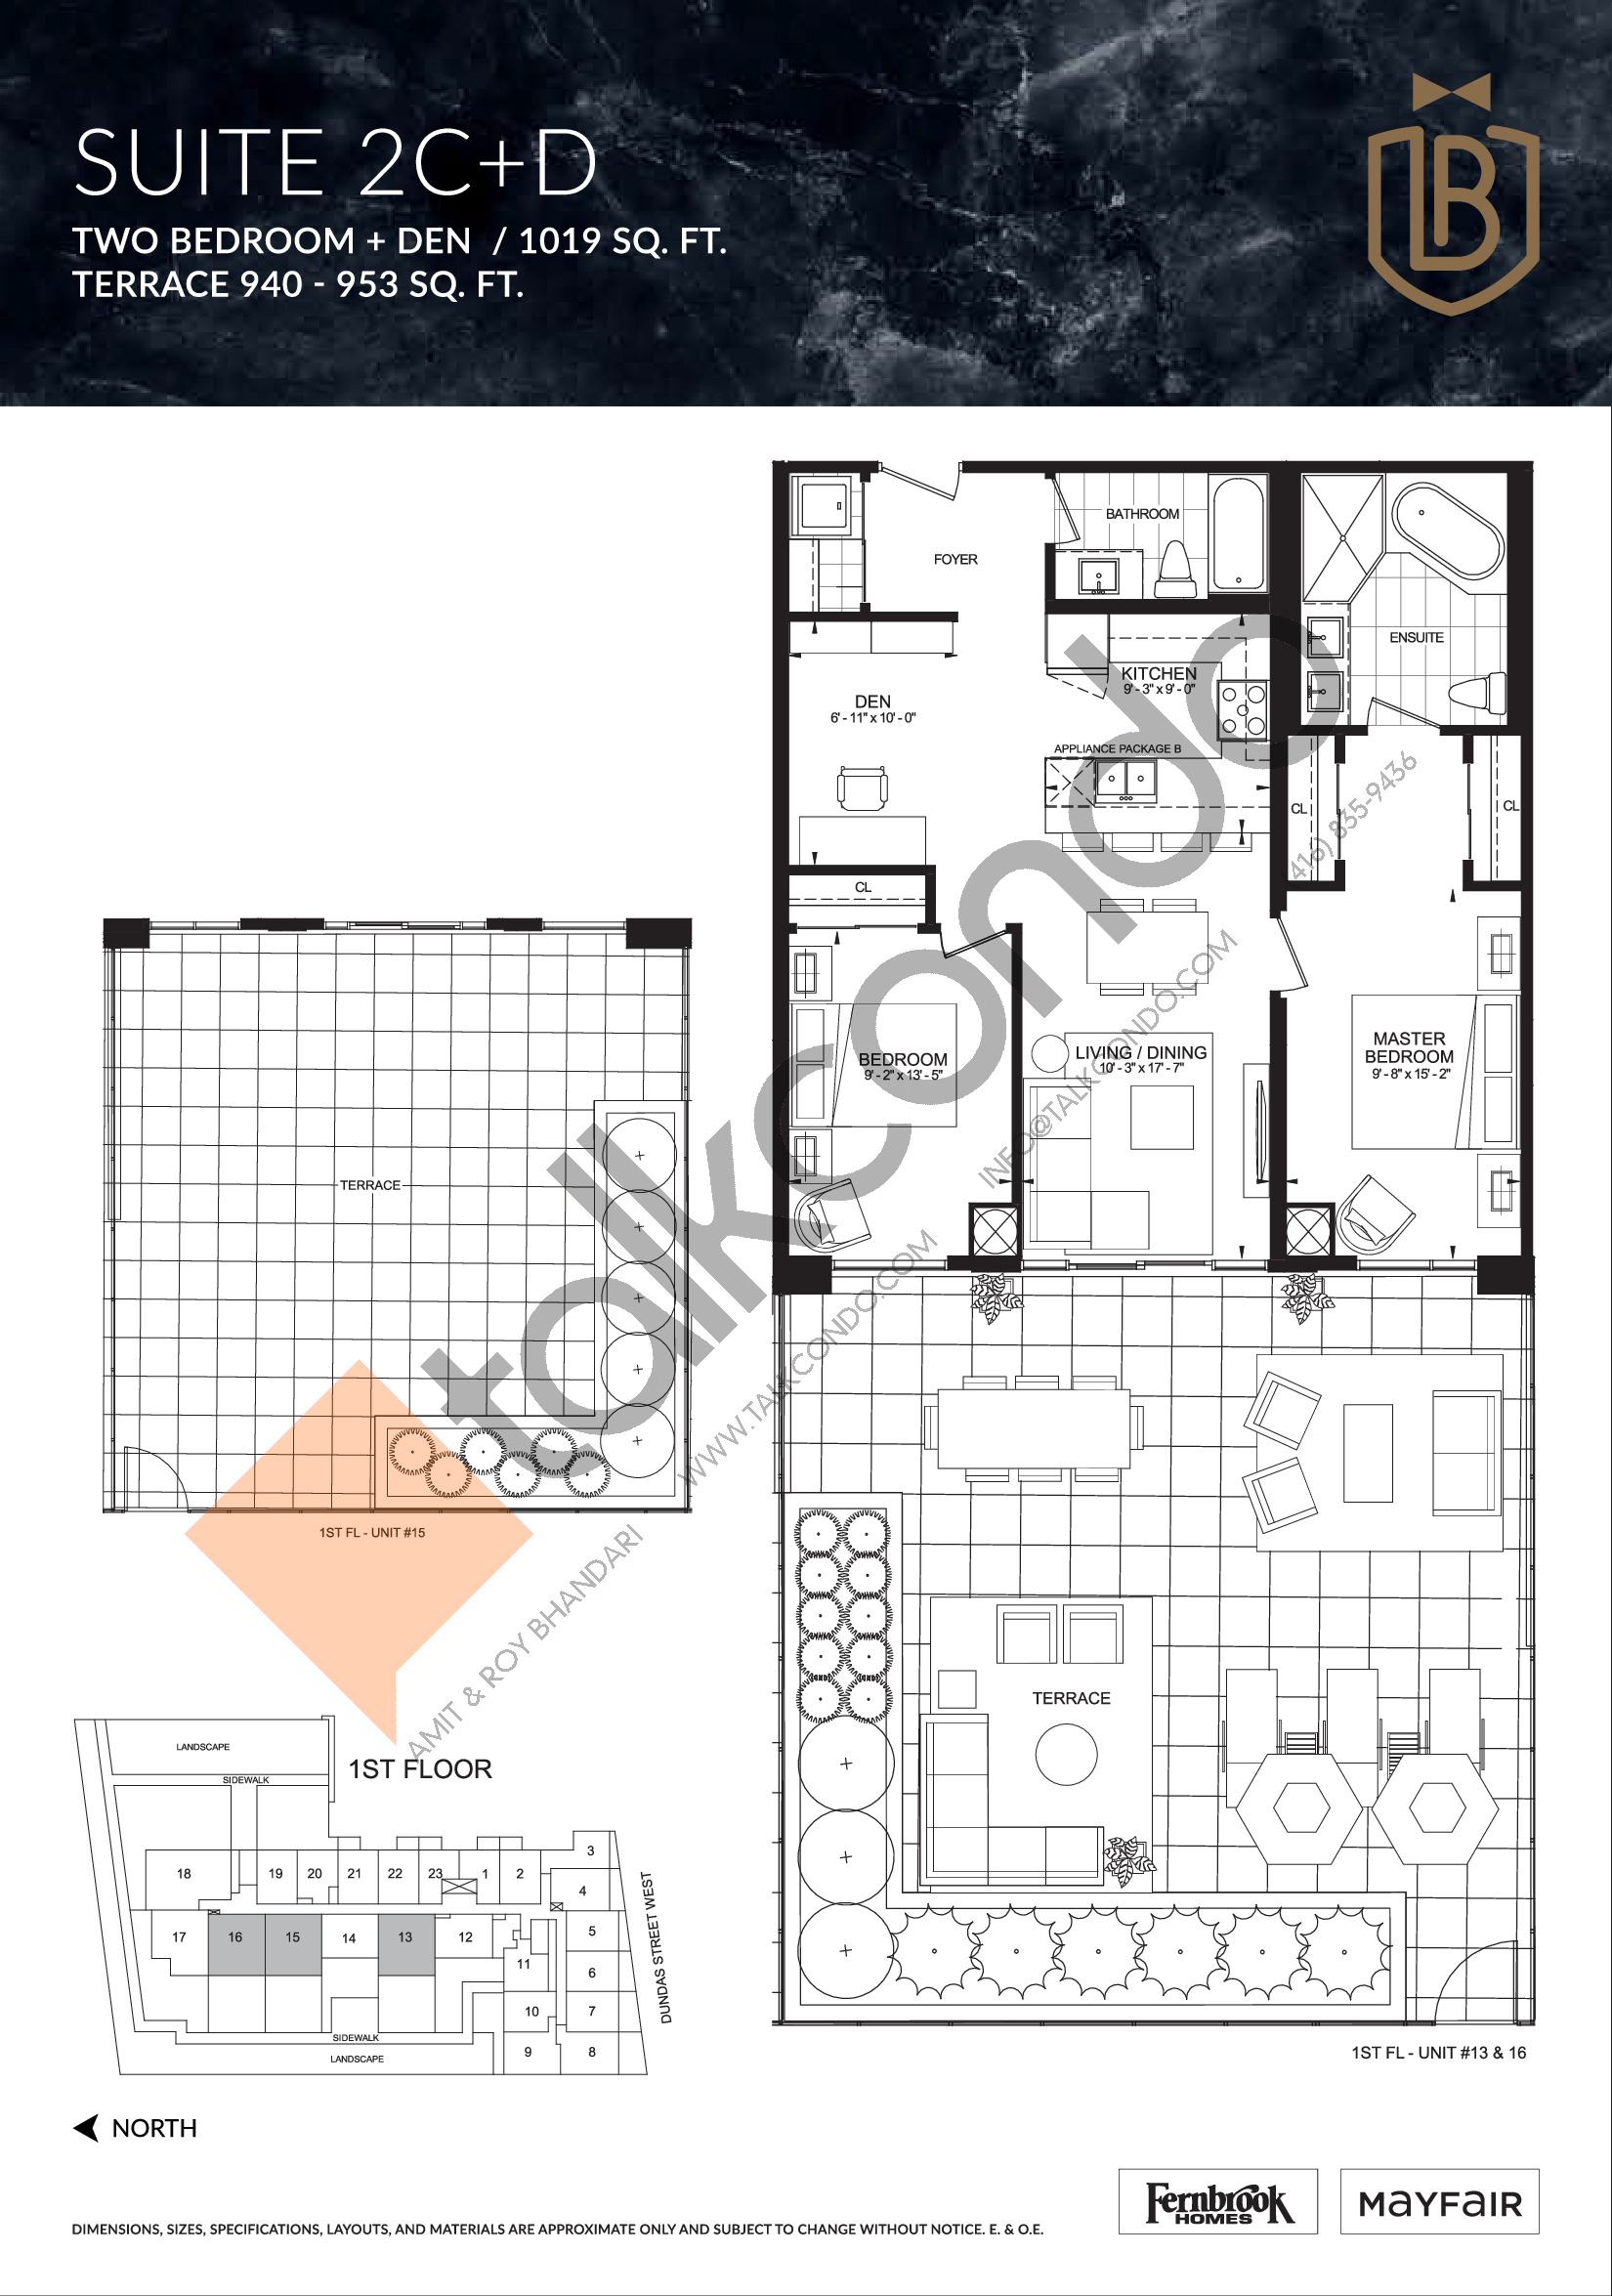 Suite 2C+D (Terrace) Floor Plan at The Butler Condos - 1019 sq.ft